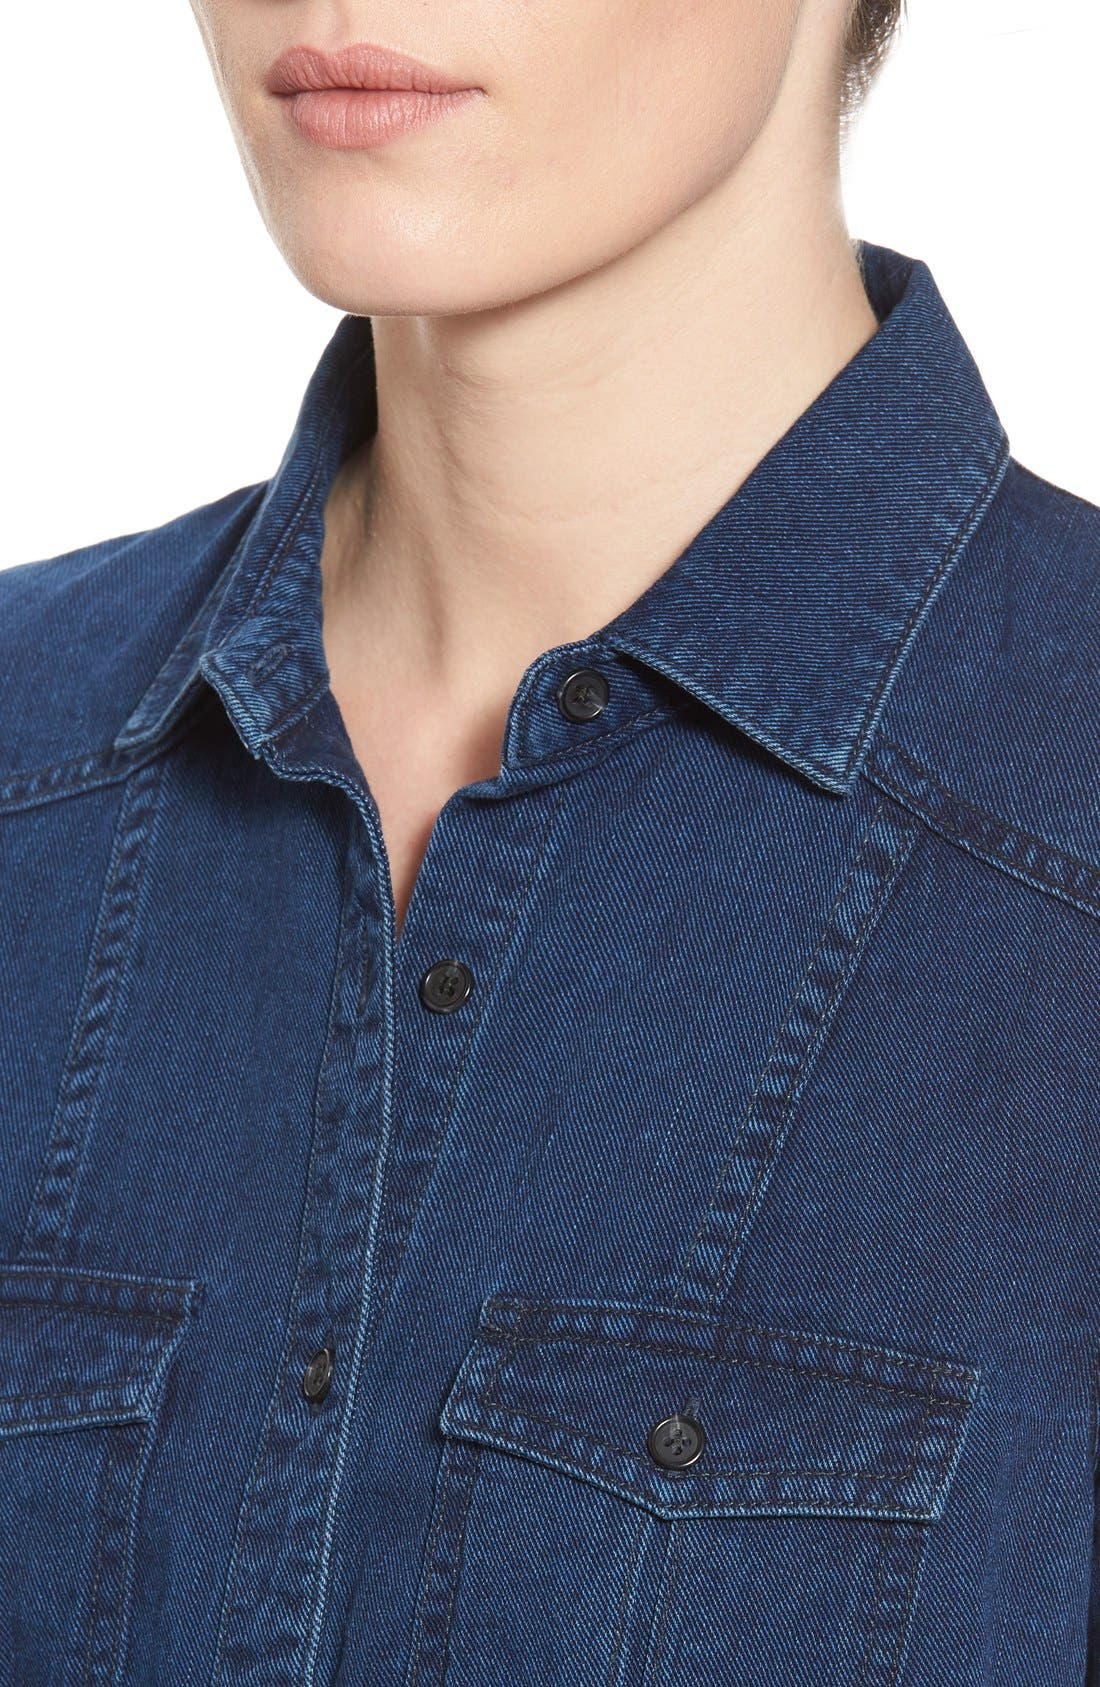 'Collector's - Leigh' Denim Shirt,                             Alternate thumbnail 4, color,                             Medium Wash